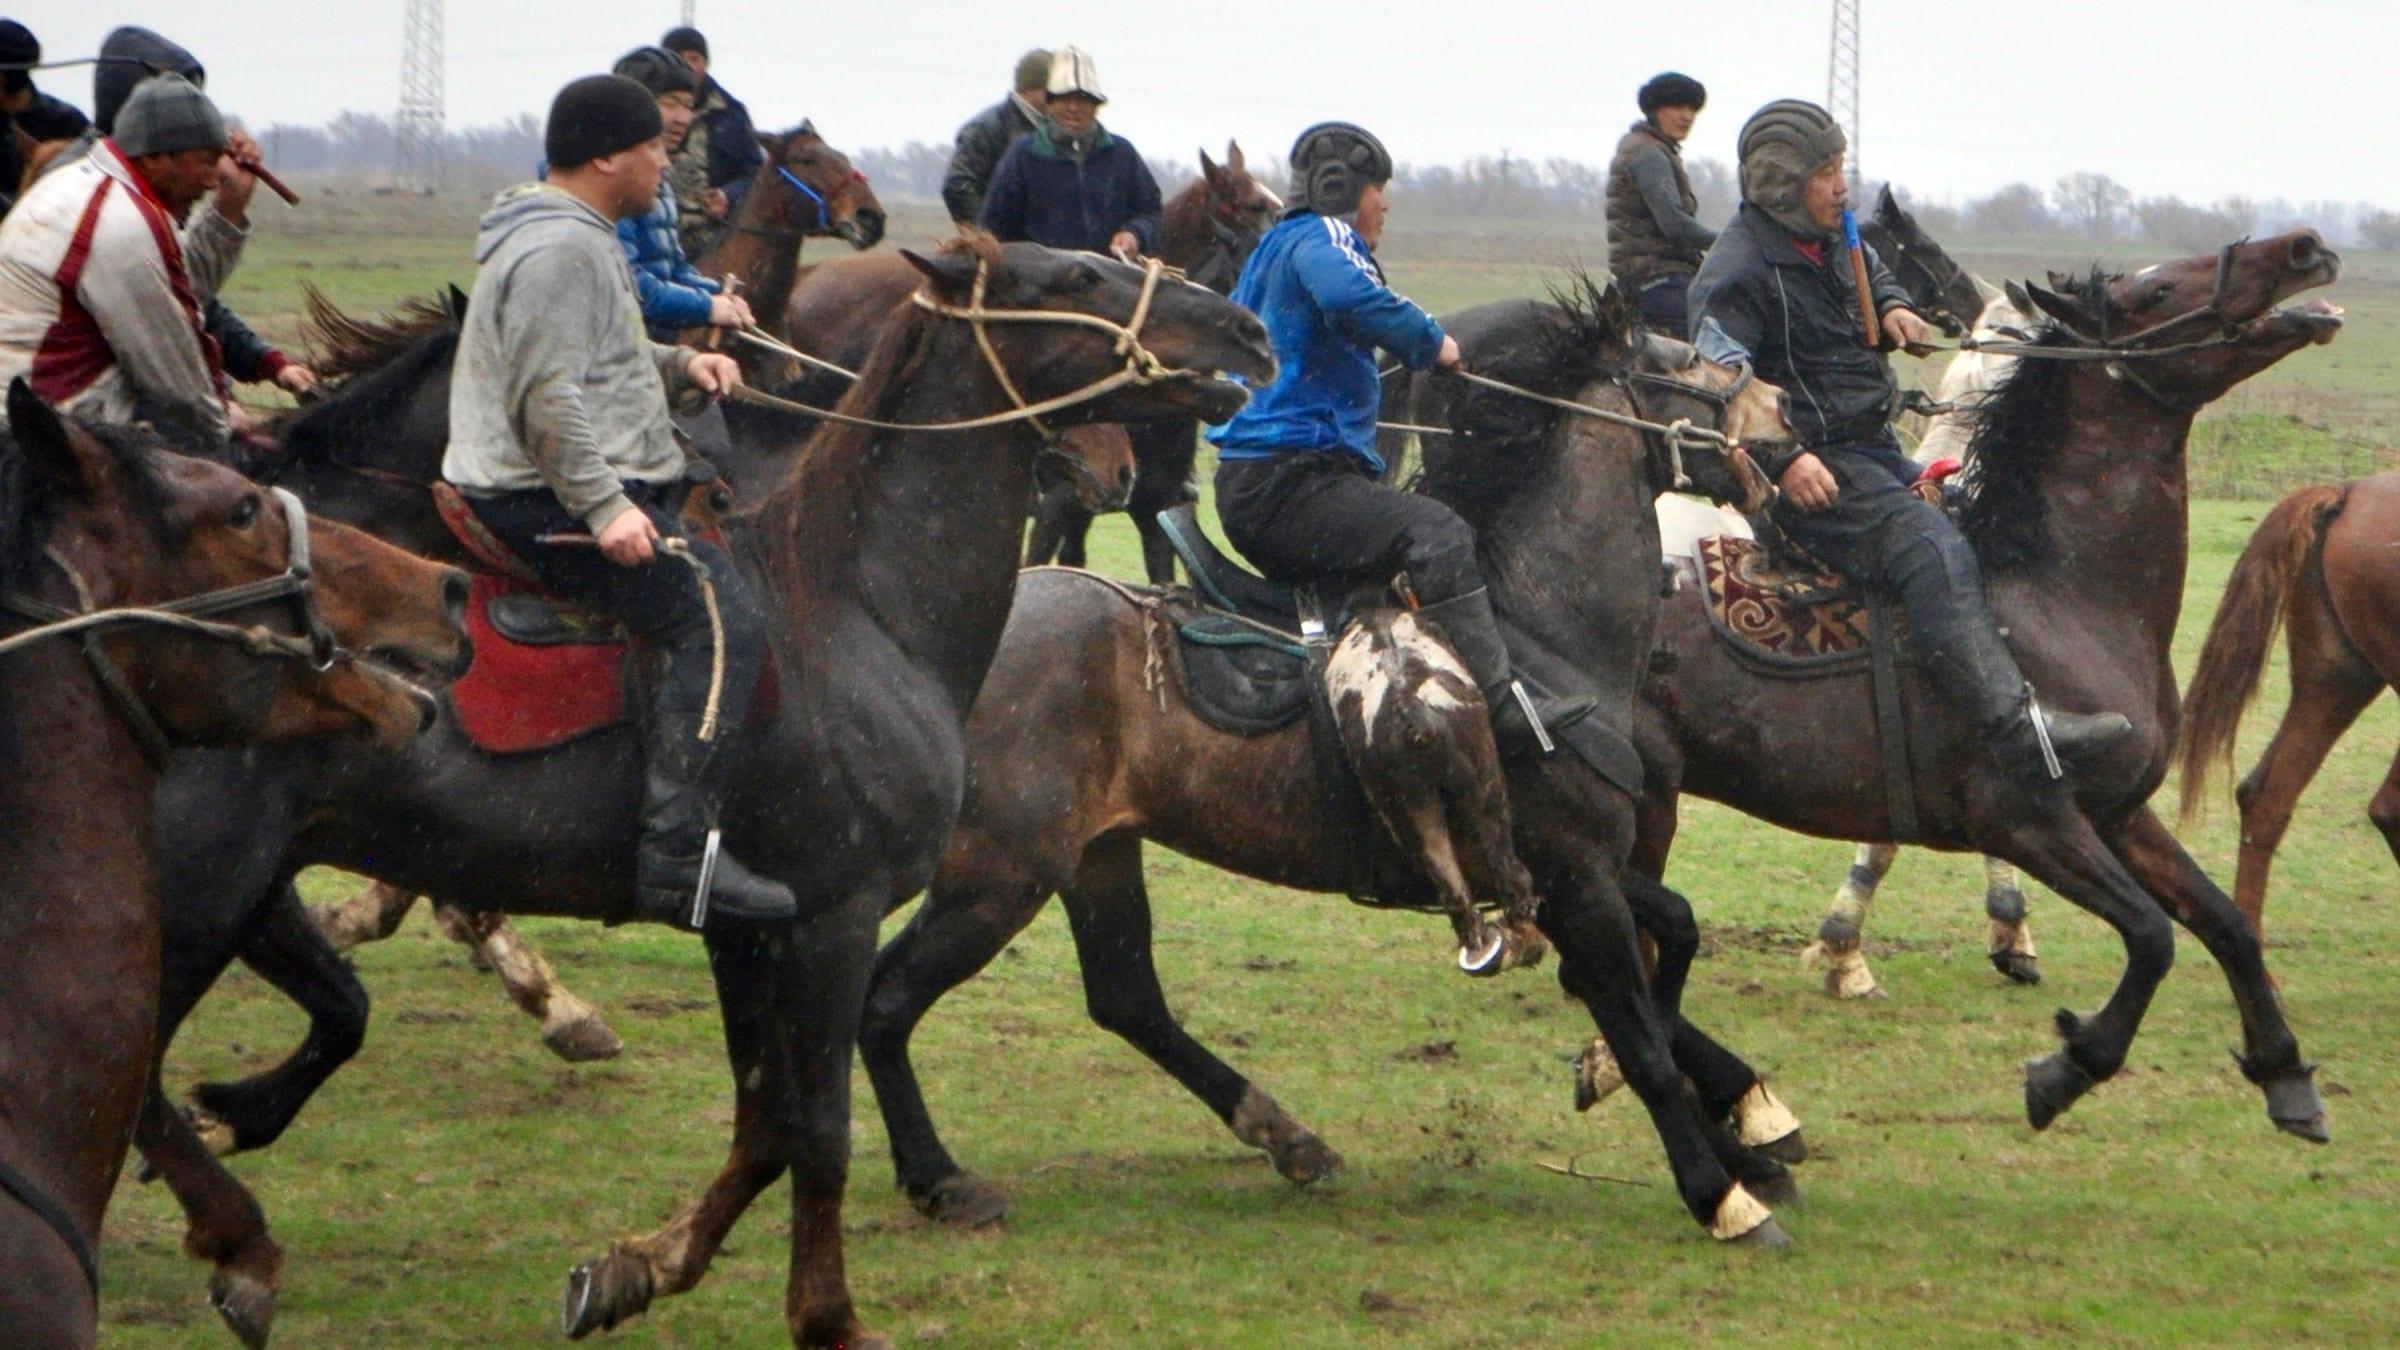 Ulak Tartysh: The Crazy, Deadly Horse 'Race' That Explains Kyrgyzstan